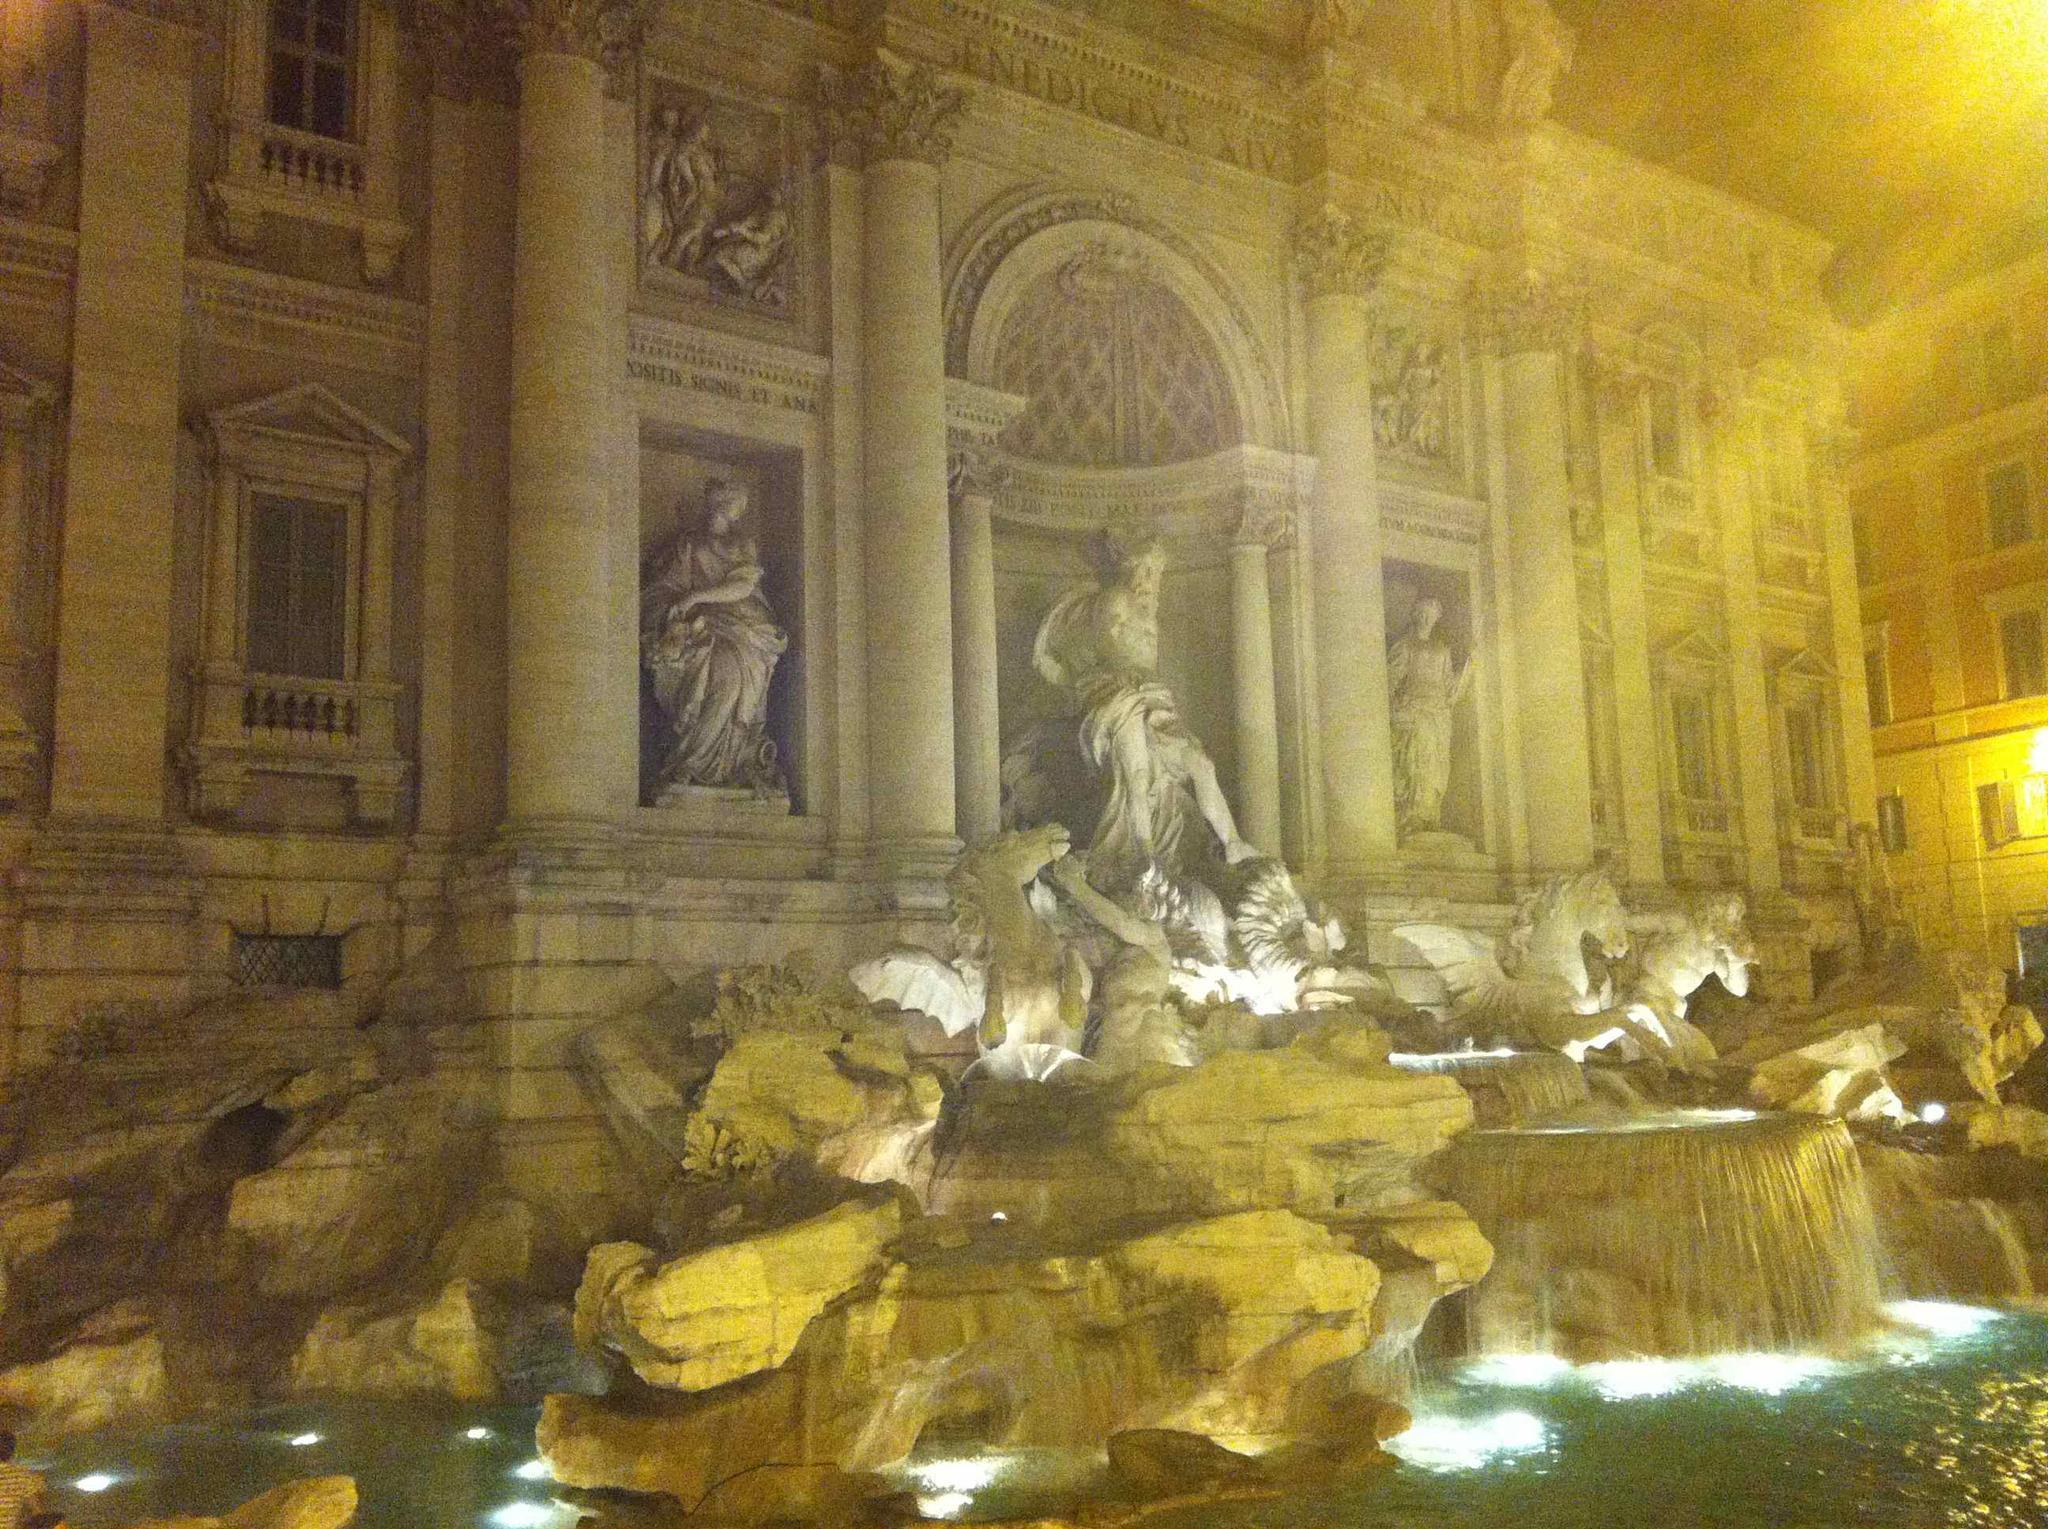 Fontana di Trivi, Rome, Italy by Richard Kennett